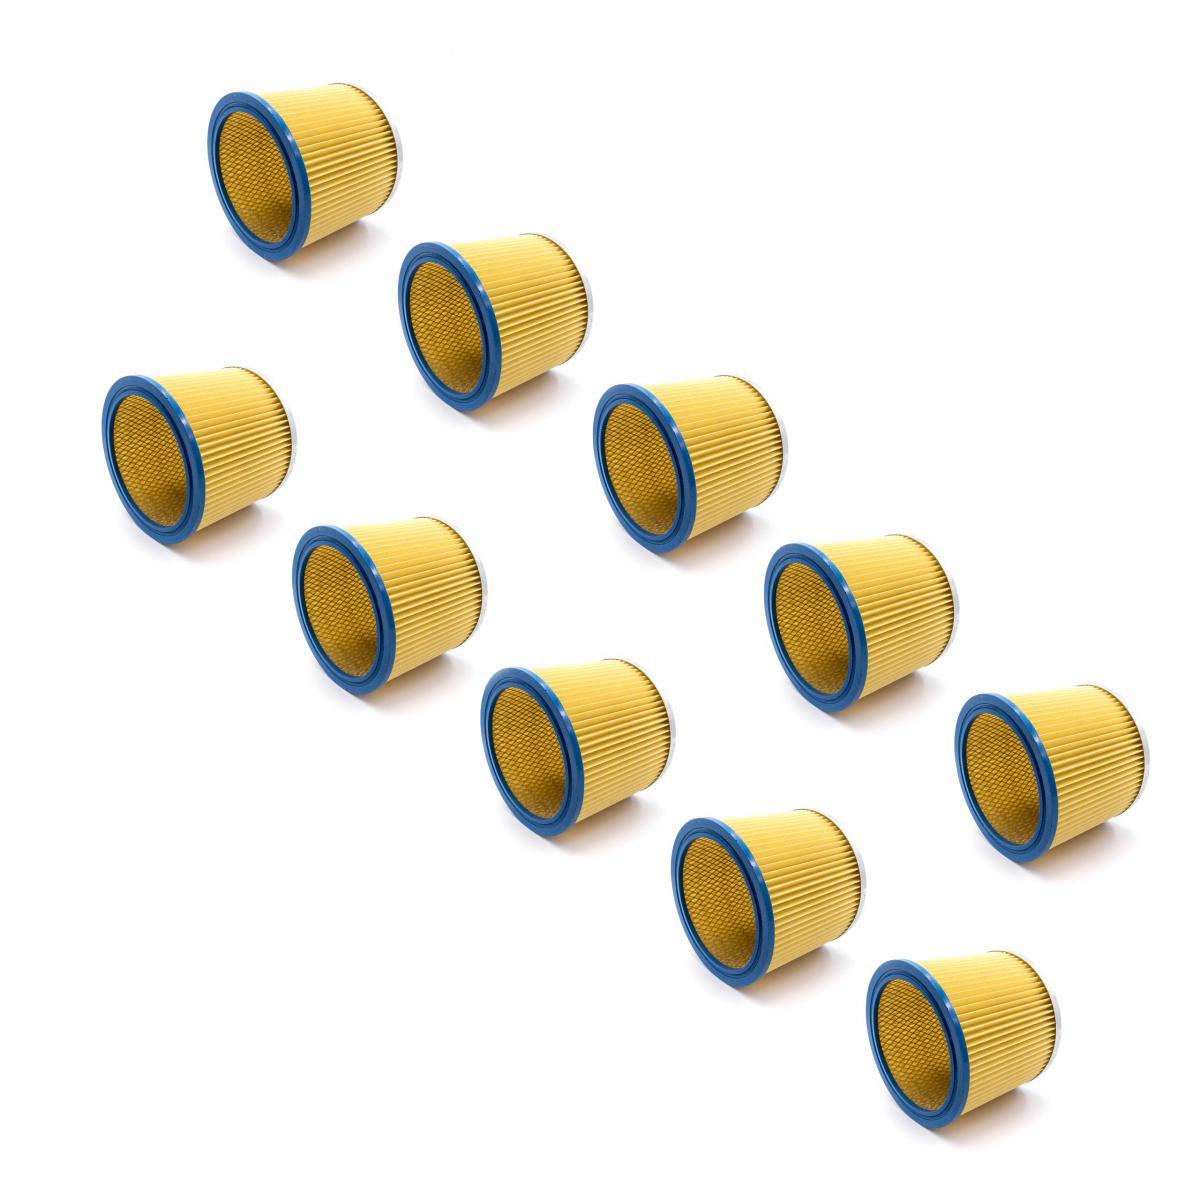 Vhbw vhbw 10x Filtre rond / filtre en lamelles pour aspirateur Shop-Vac Super 615 S2, Super 760, Ultra 40 Blower